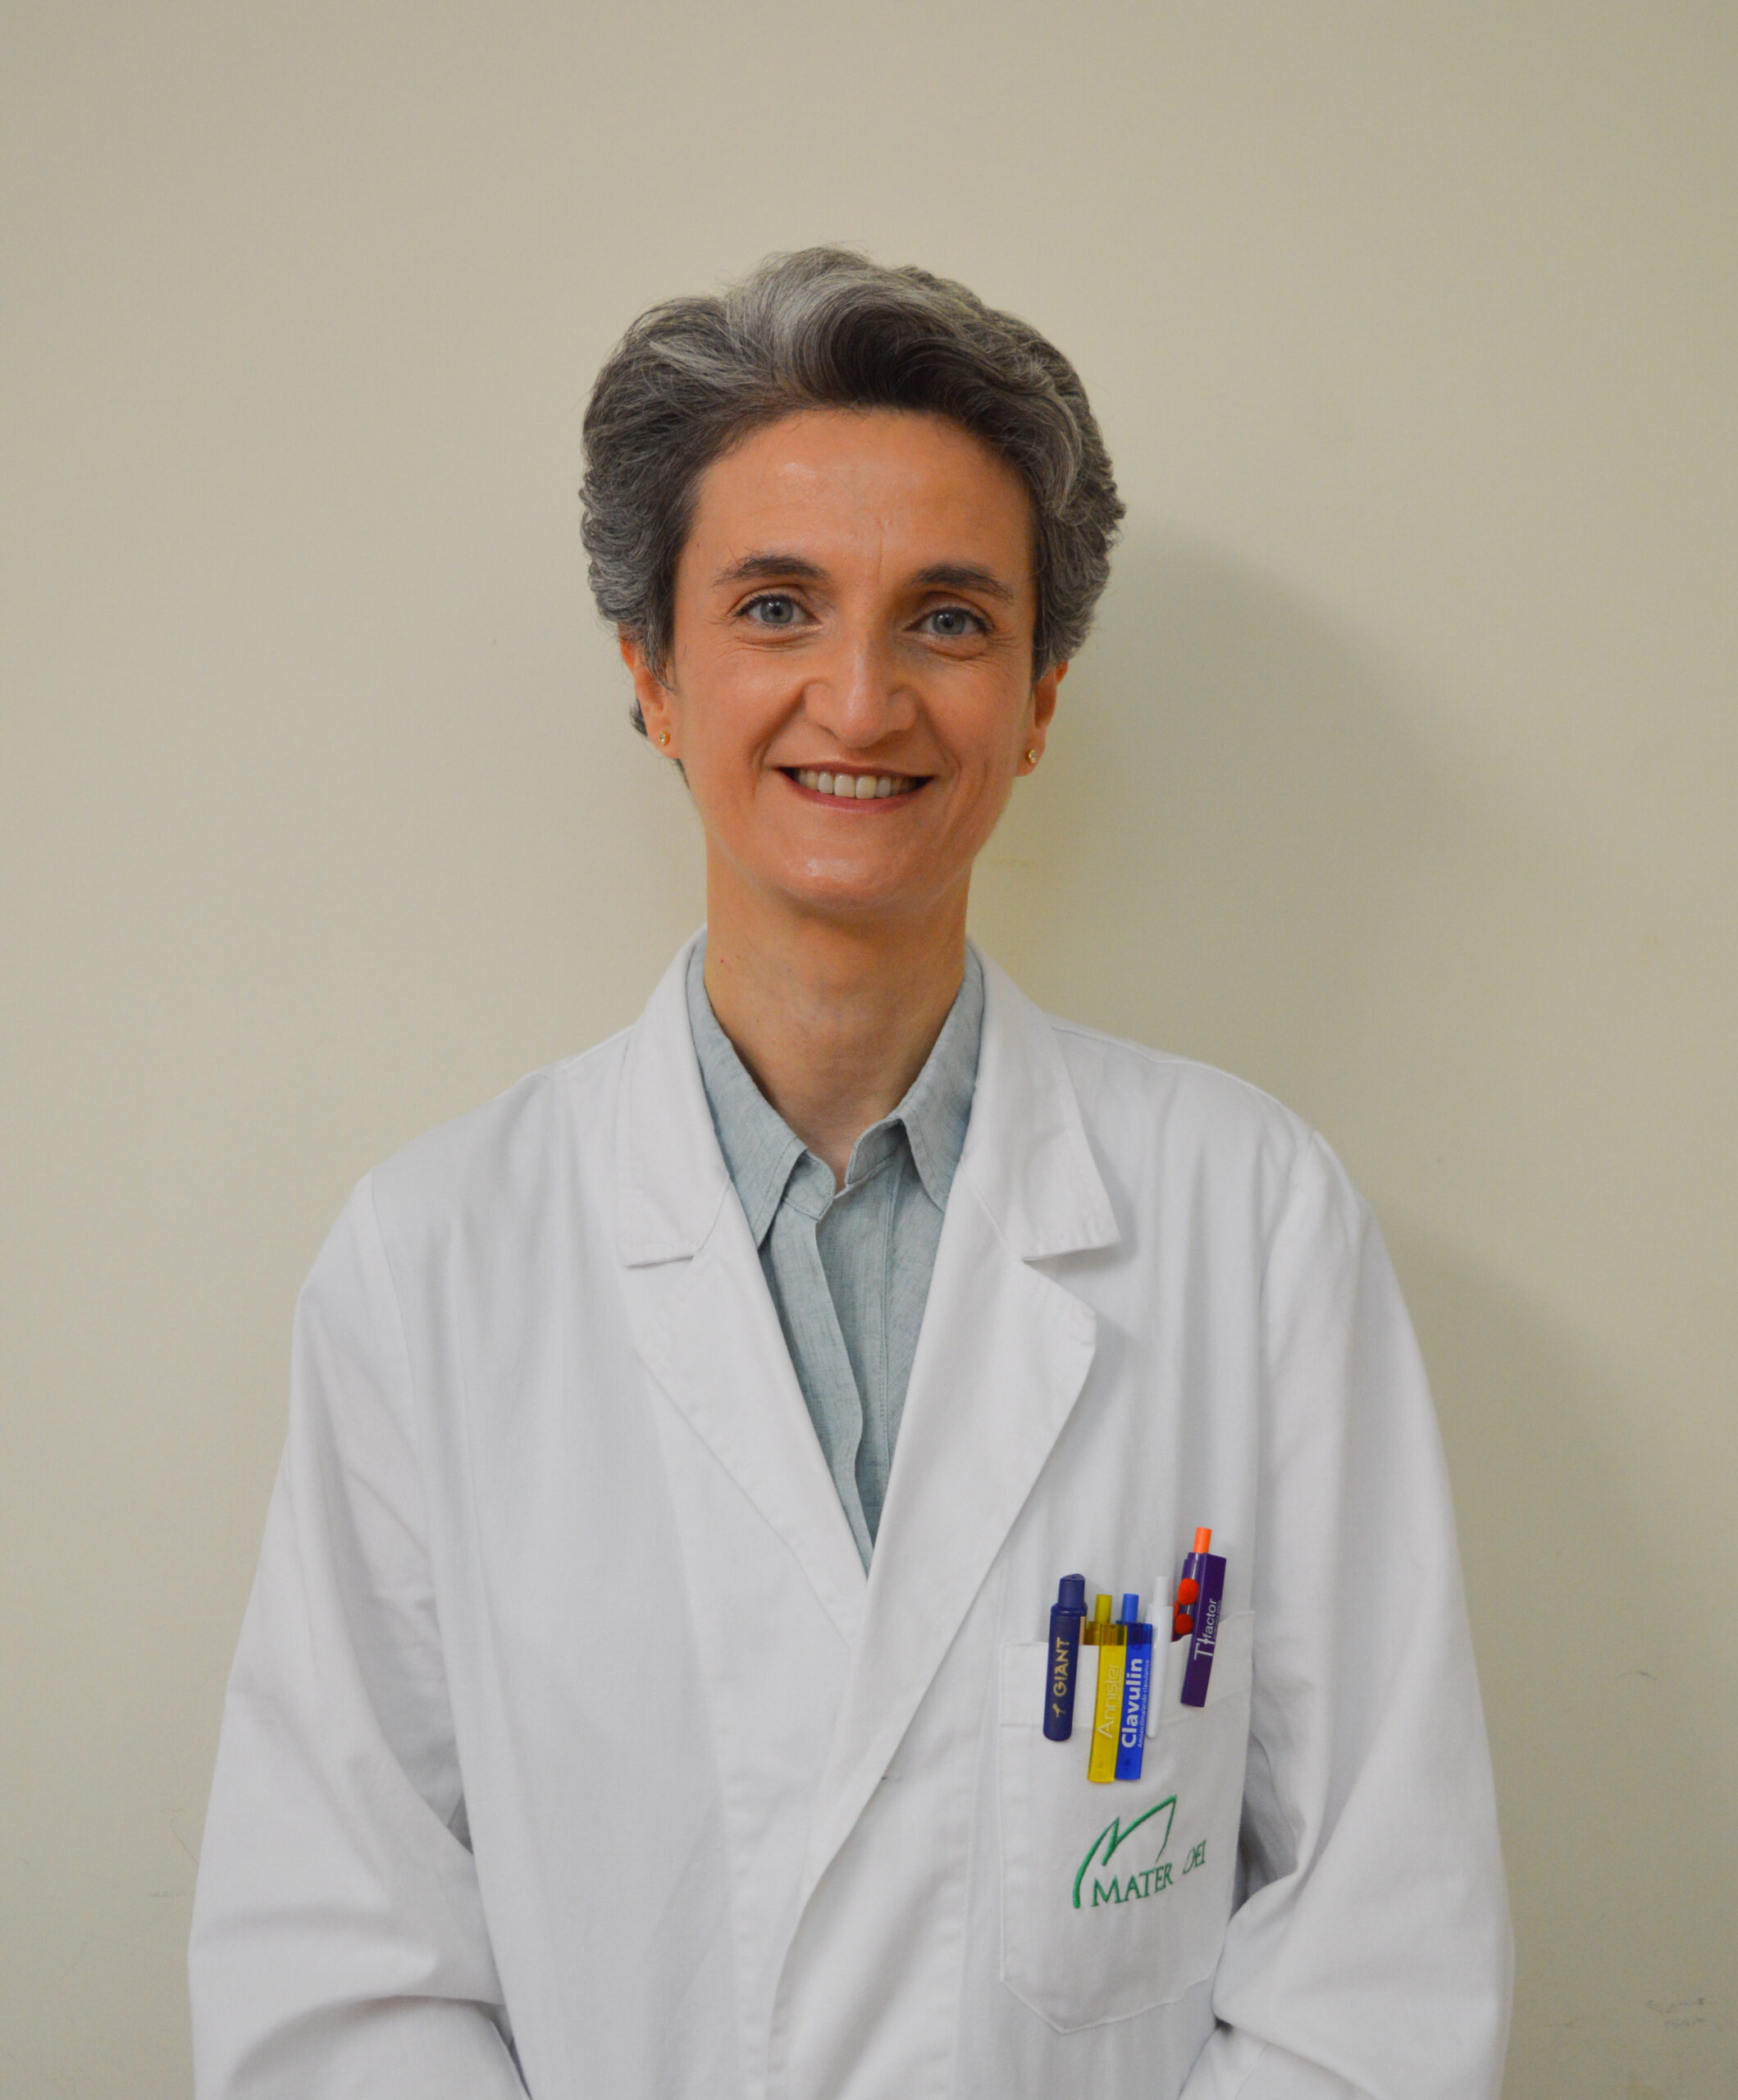 Dott.ssa Annunziata Cavallaro